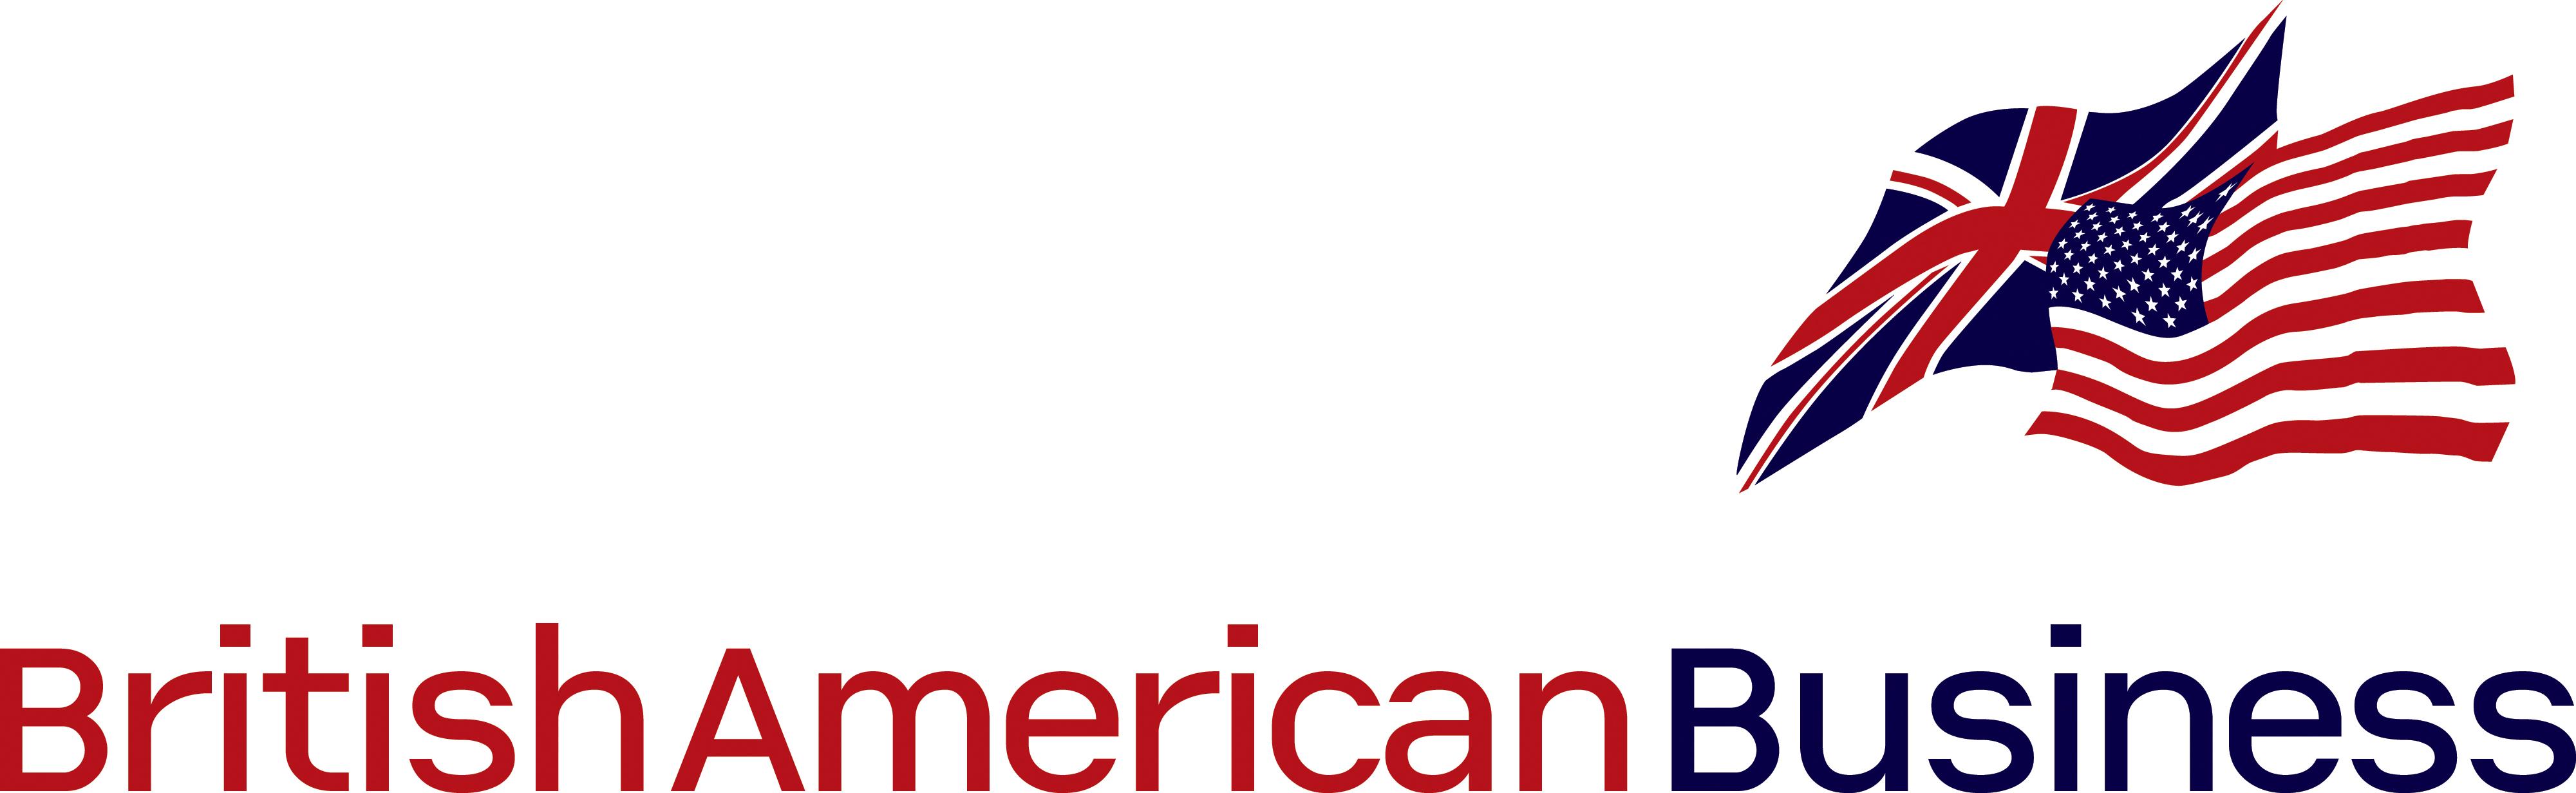 BAB logo rgb